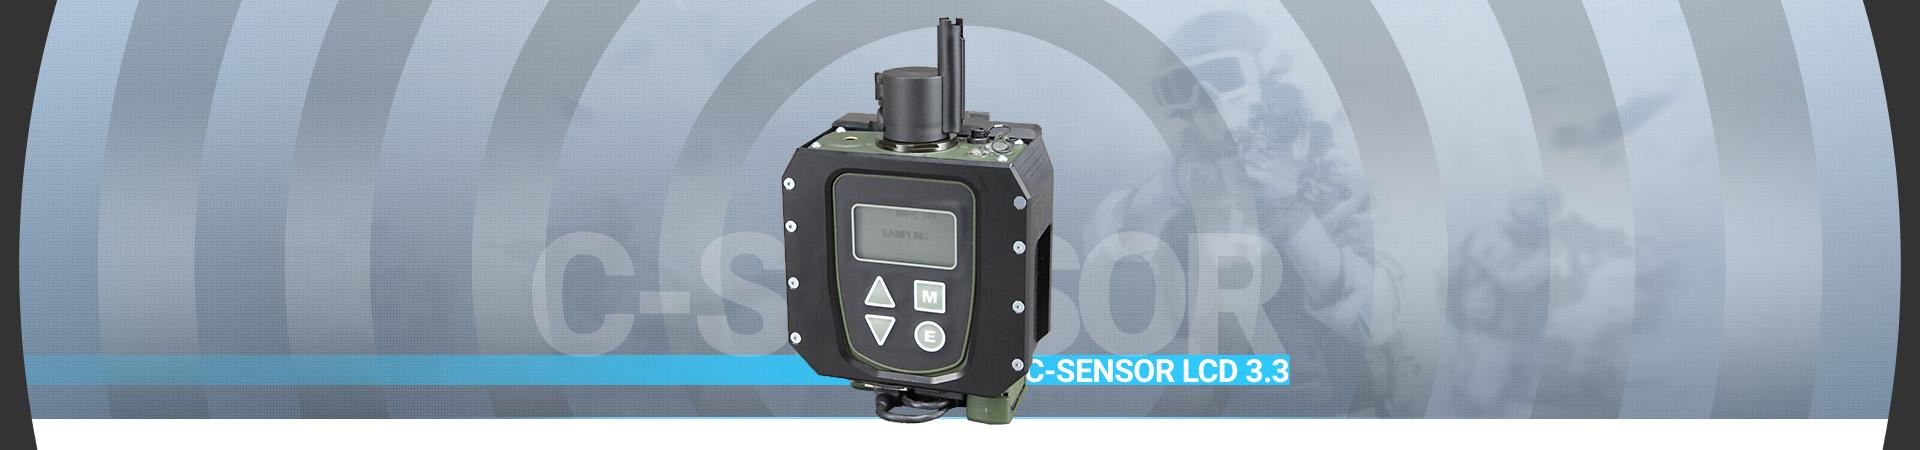 Akcesoria CBRN C-Sensor LCD3.3